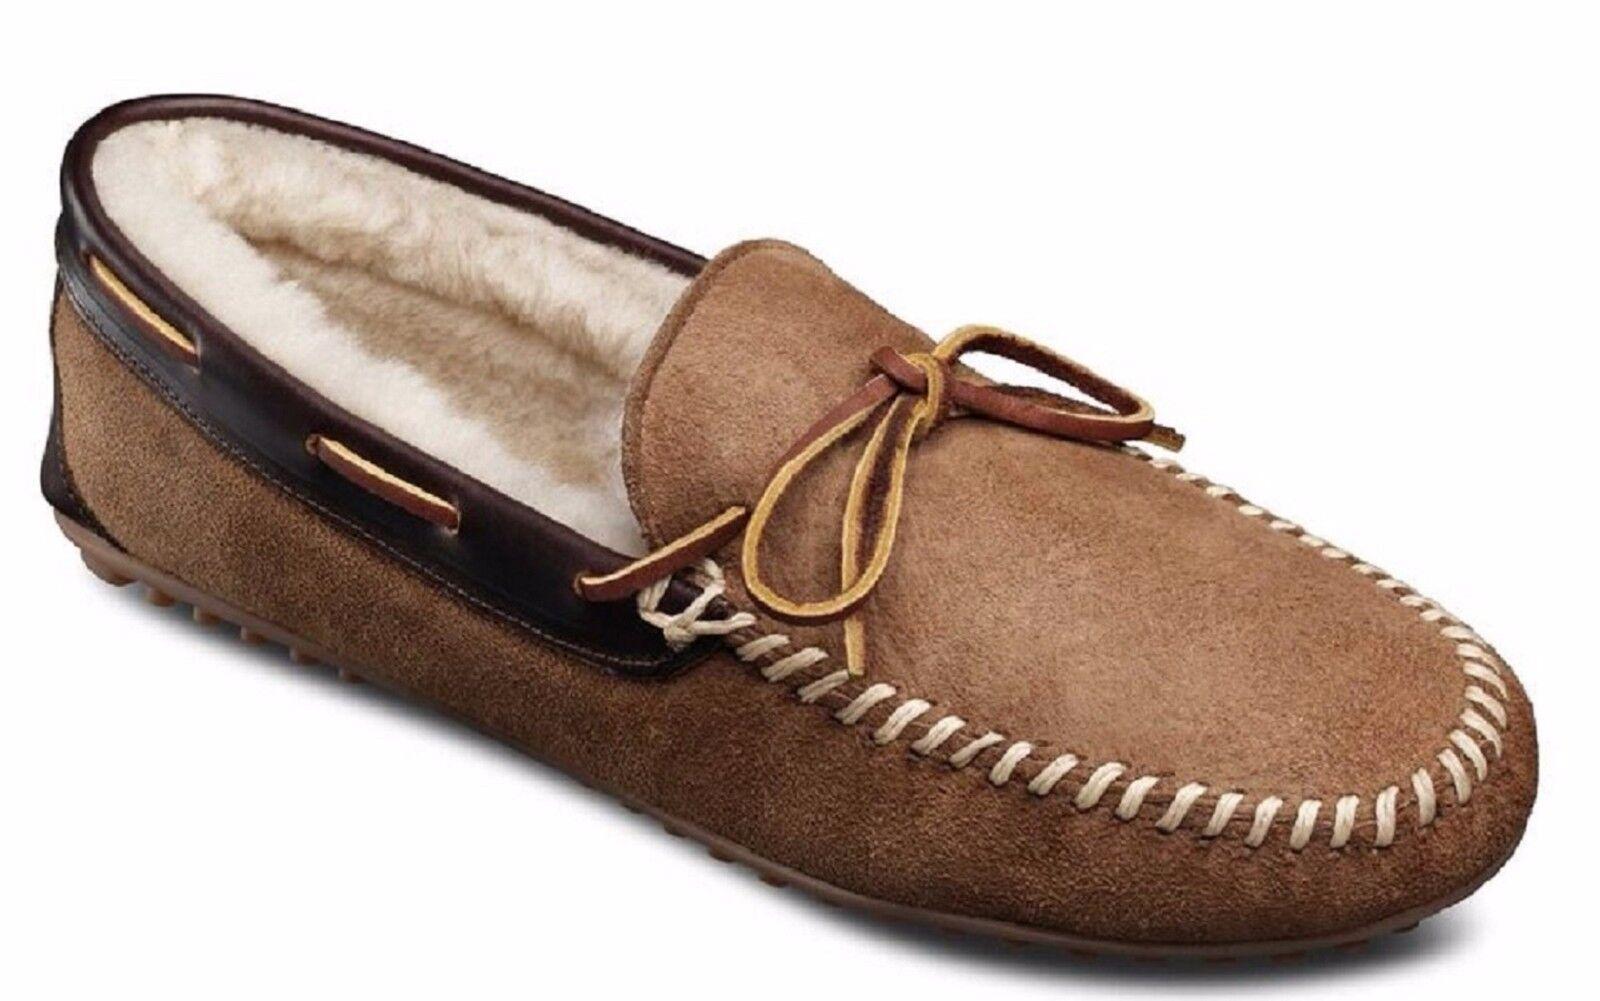 Allen Edmonds Men's Sandman Sheepskin Shearling Slippers Loafers Natural 9 E